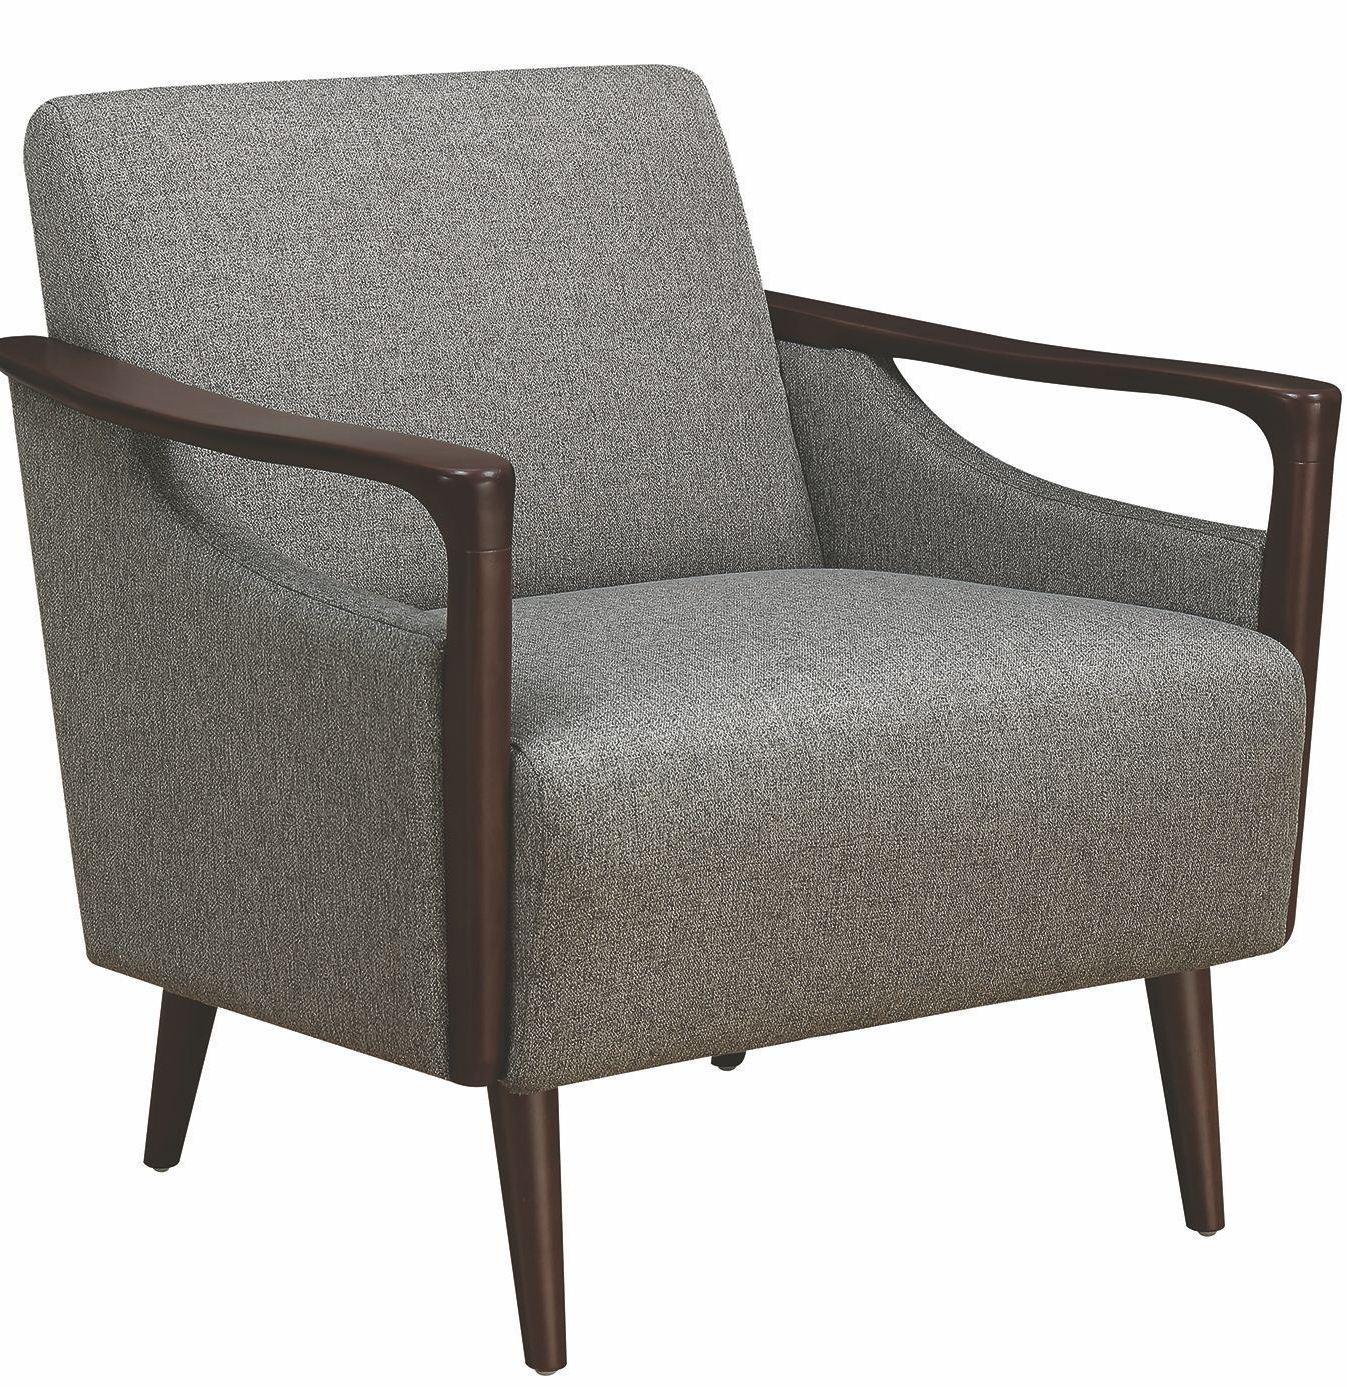 Scott Living Causal Grey Accent Chair: Gray Accent Chair By Scott Living From Coaster